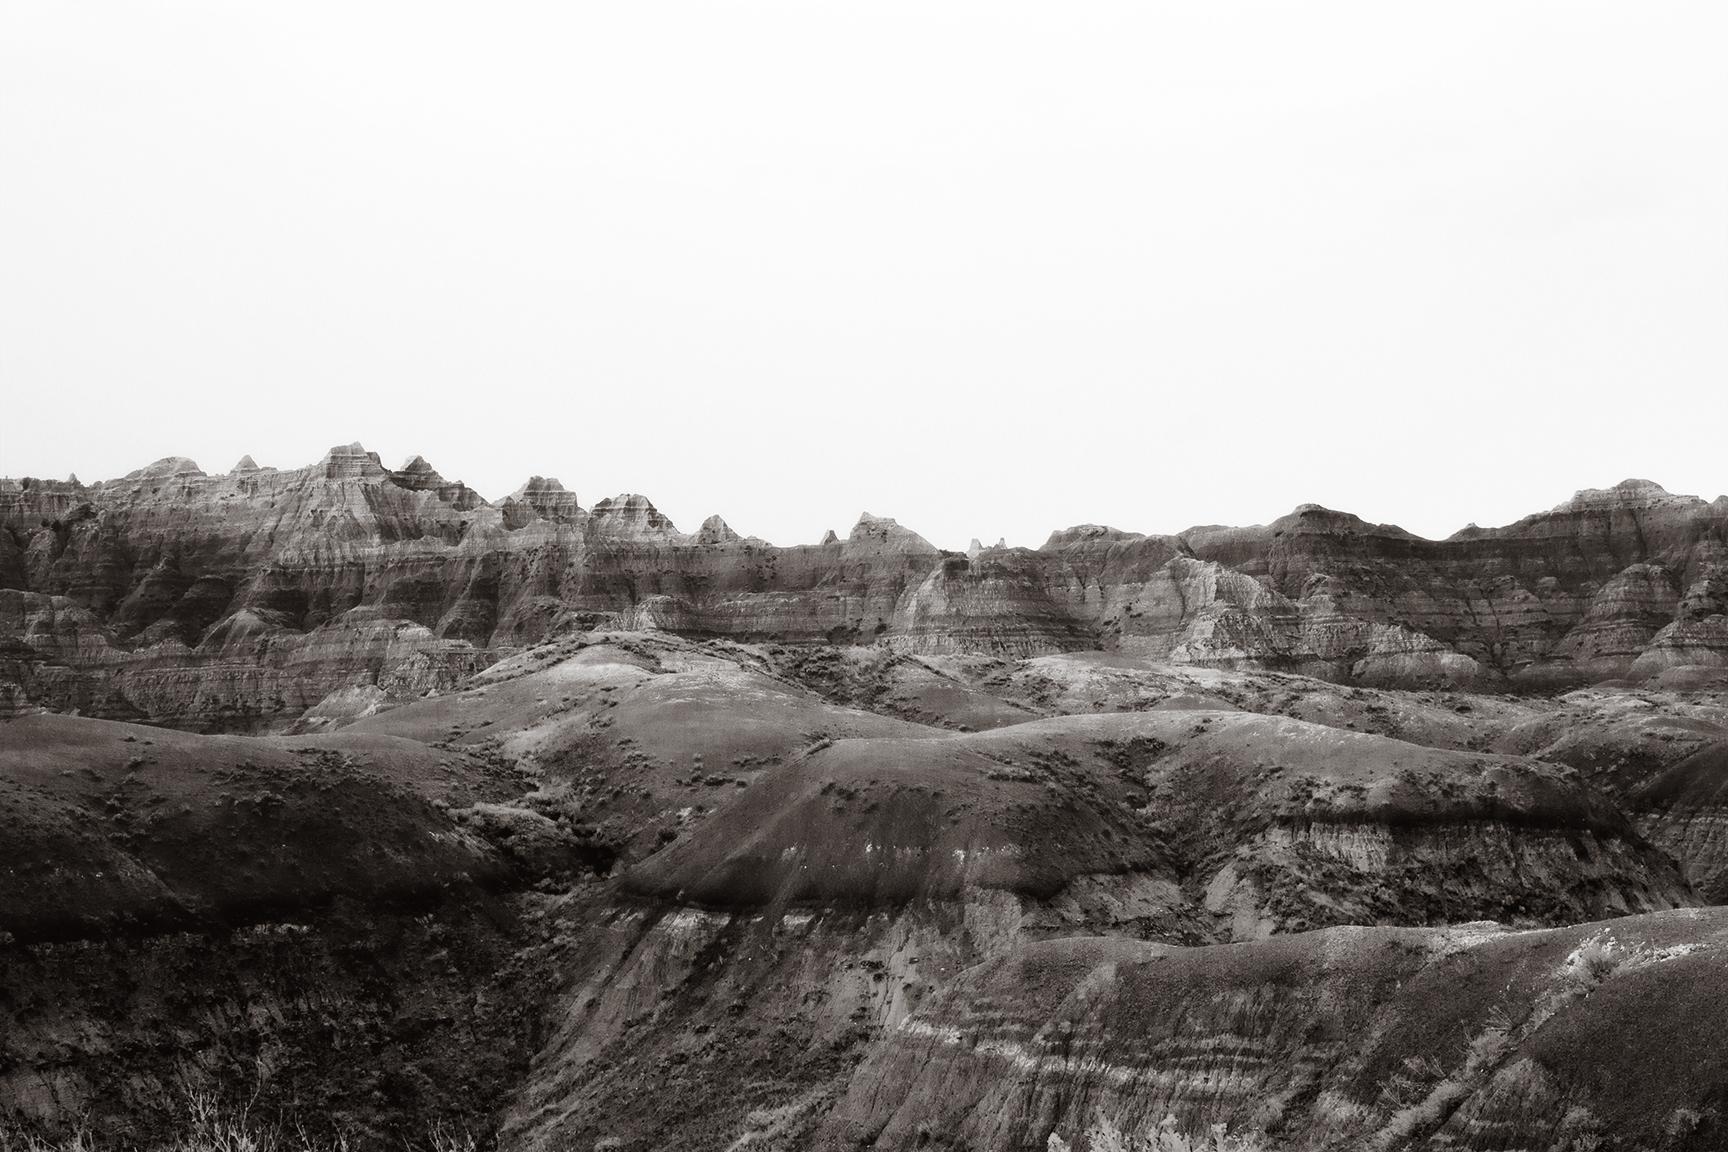 Bighorn-8 c, 2018